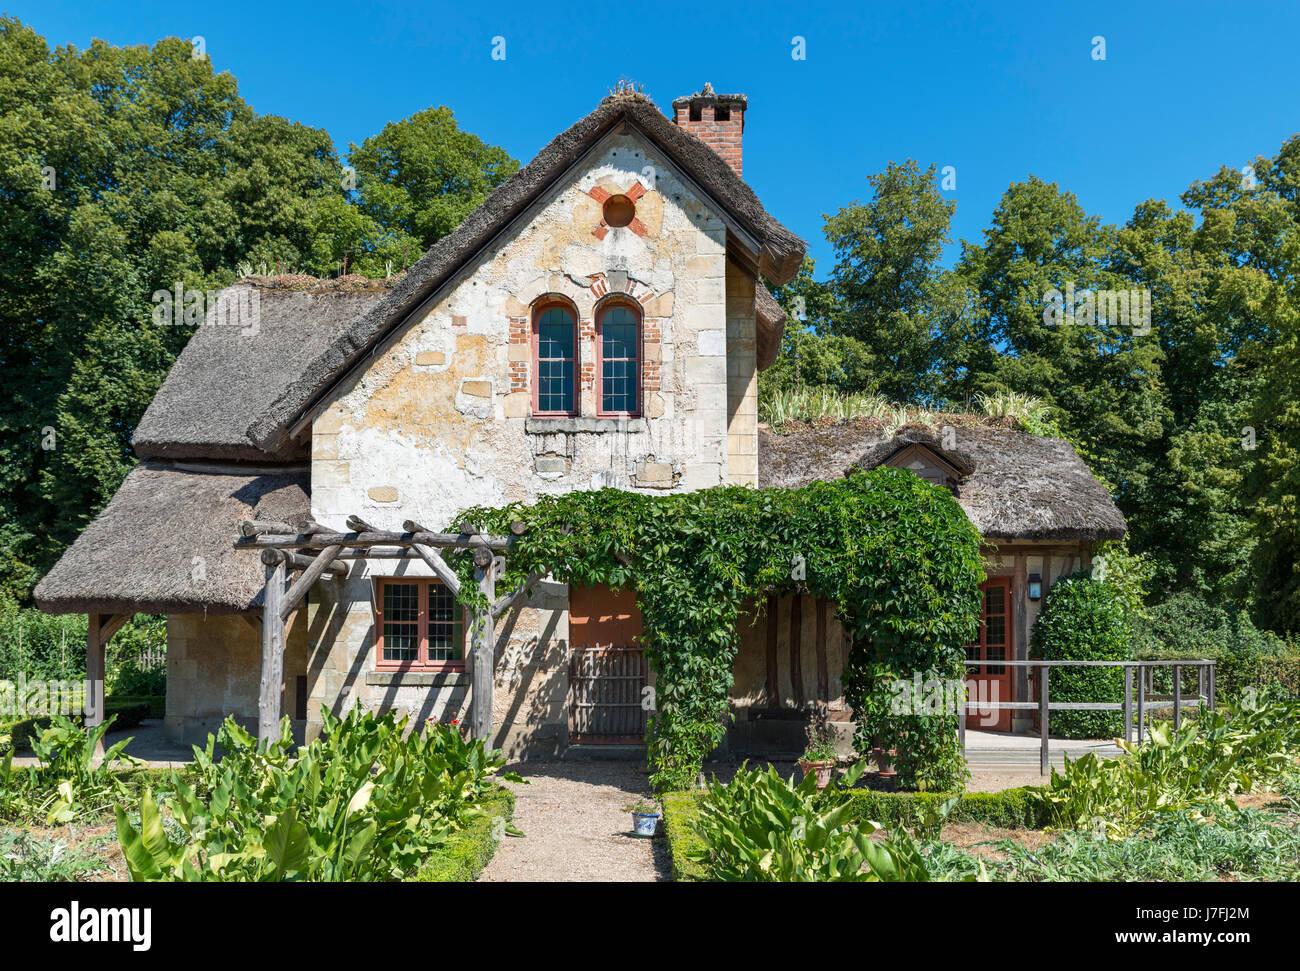 La Maison du Jardinier (Gärtnerhaus) im Hameau De La Reine (Königin Hamlet), Château de Versailles, Stockbild